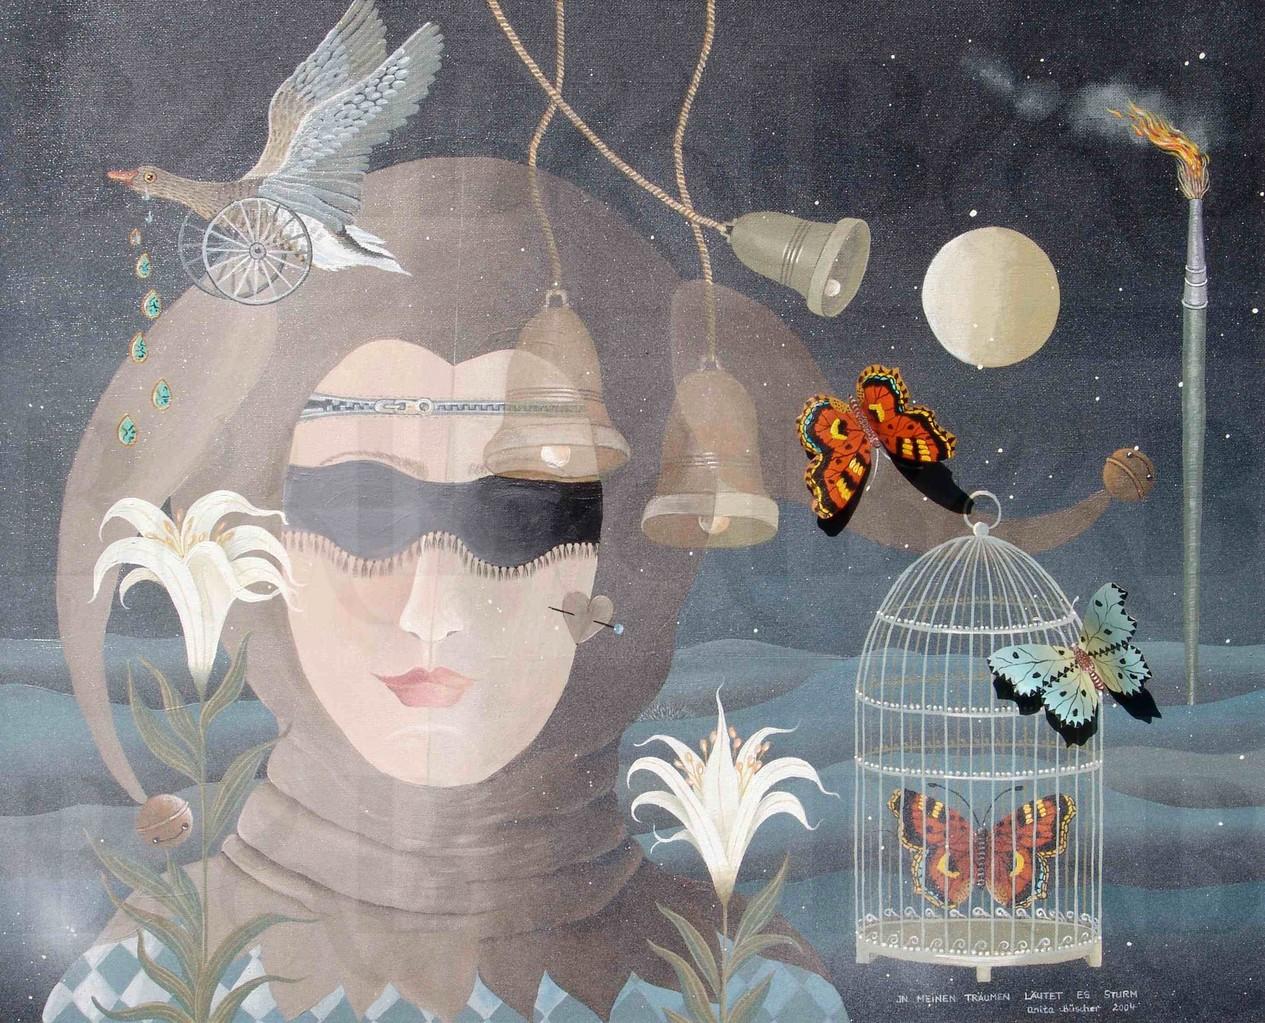 01 In meinen Träumen - Mascha Kaleko, 2004